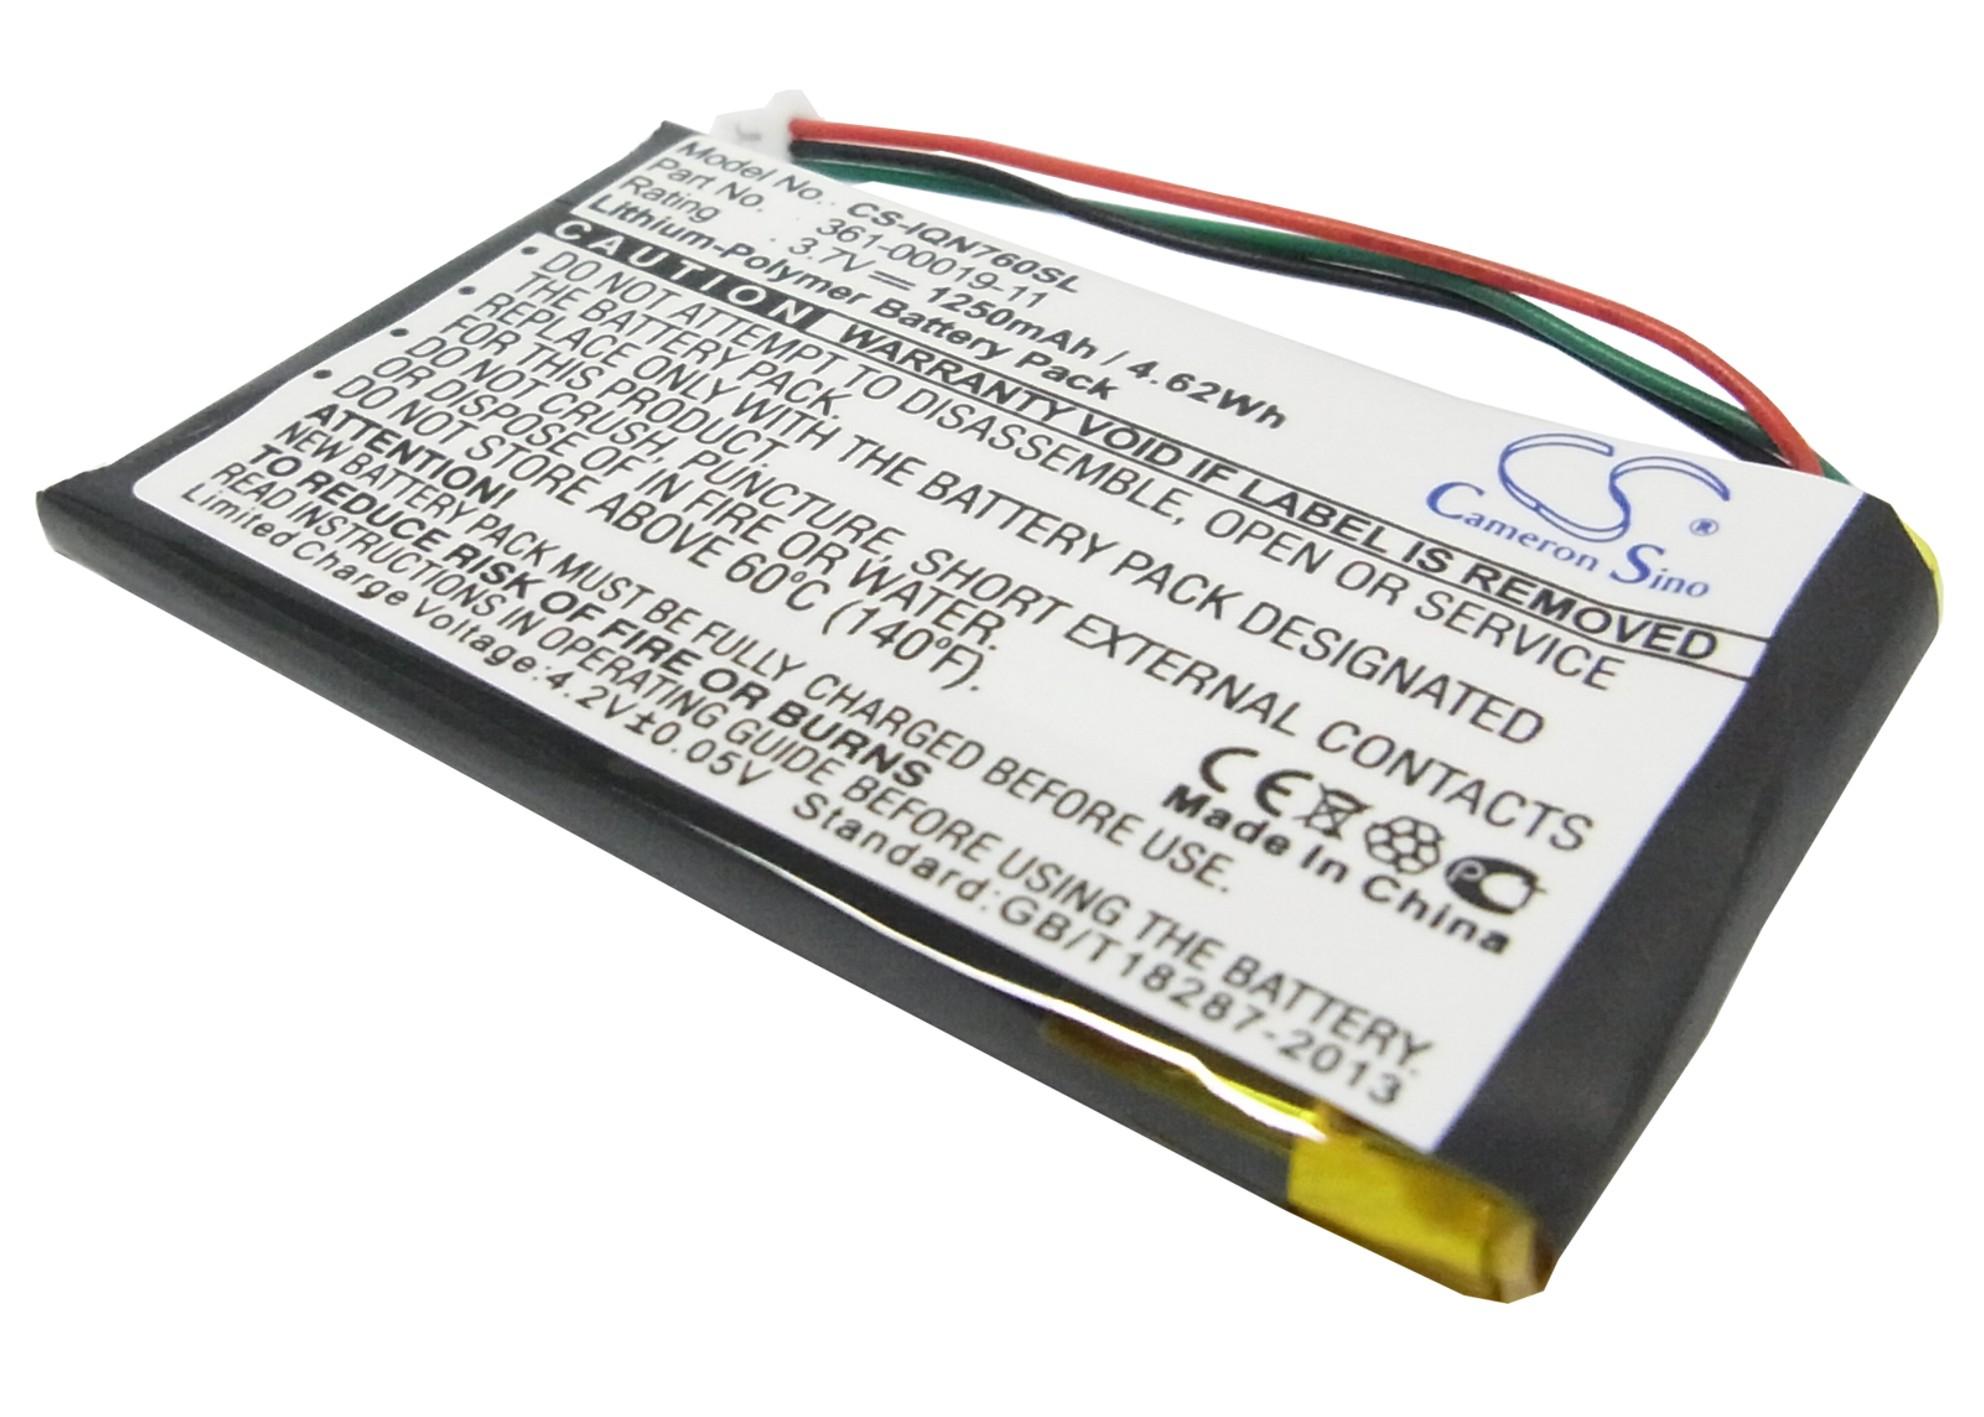 Cameron Sino baterie do navigací (gps) pro GARMIN Nuvi 765 3.7V Li-Polymer 1250mAh černá - neoriginální